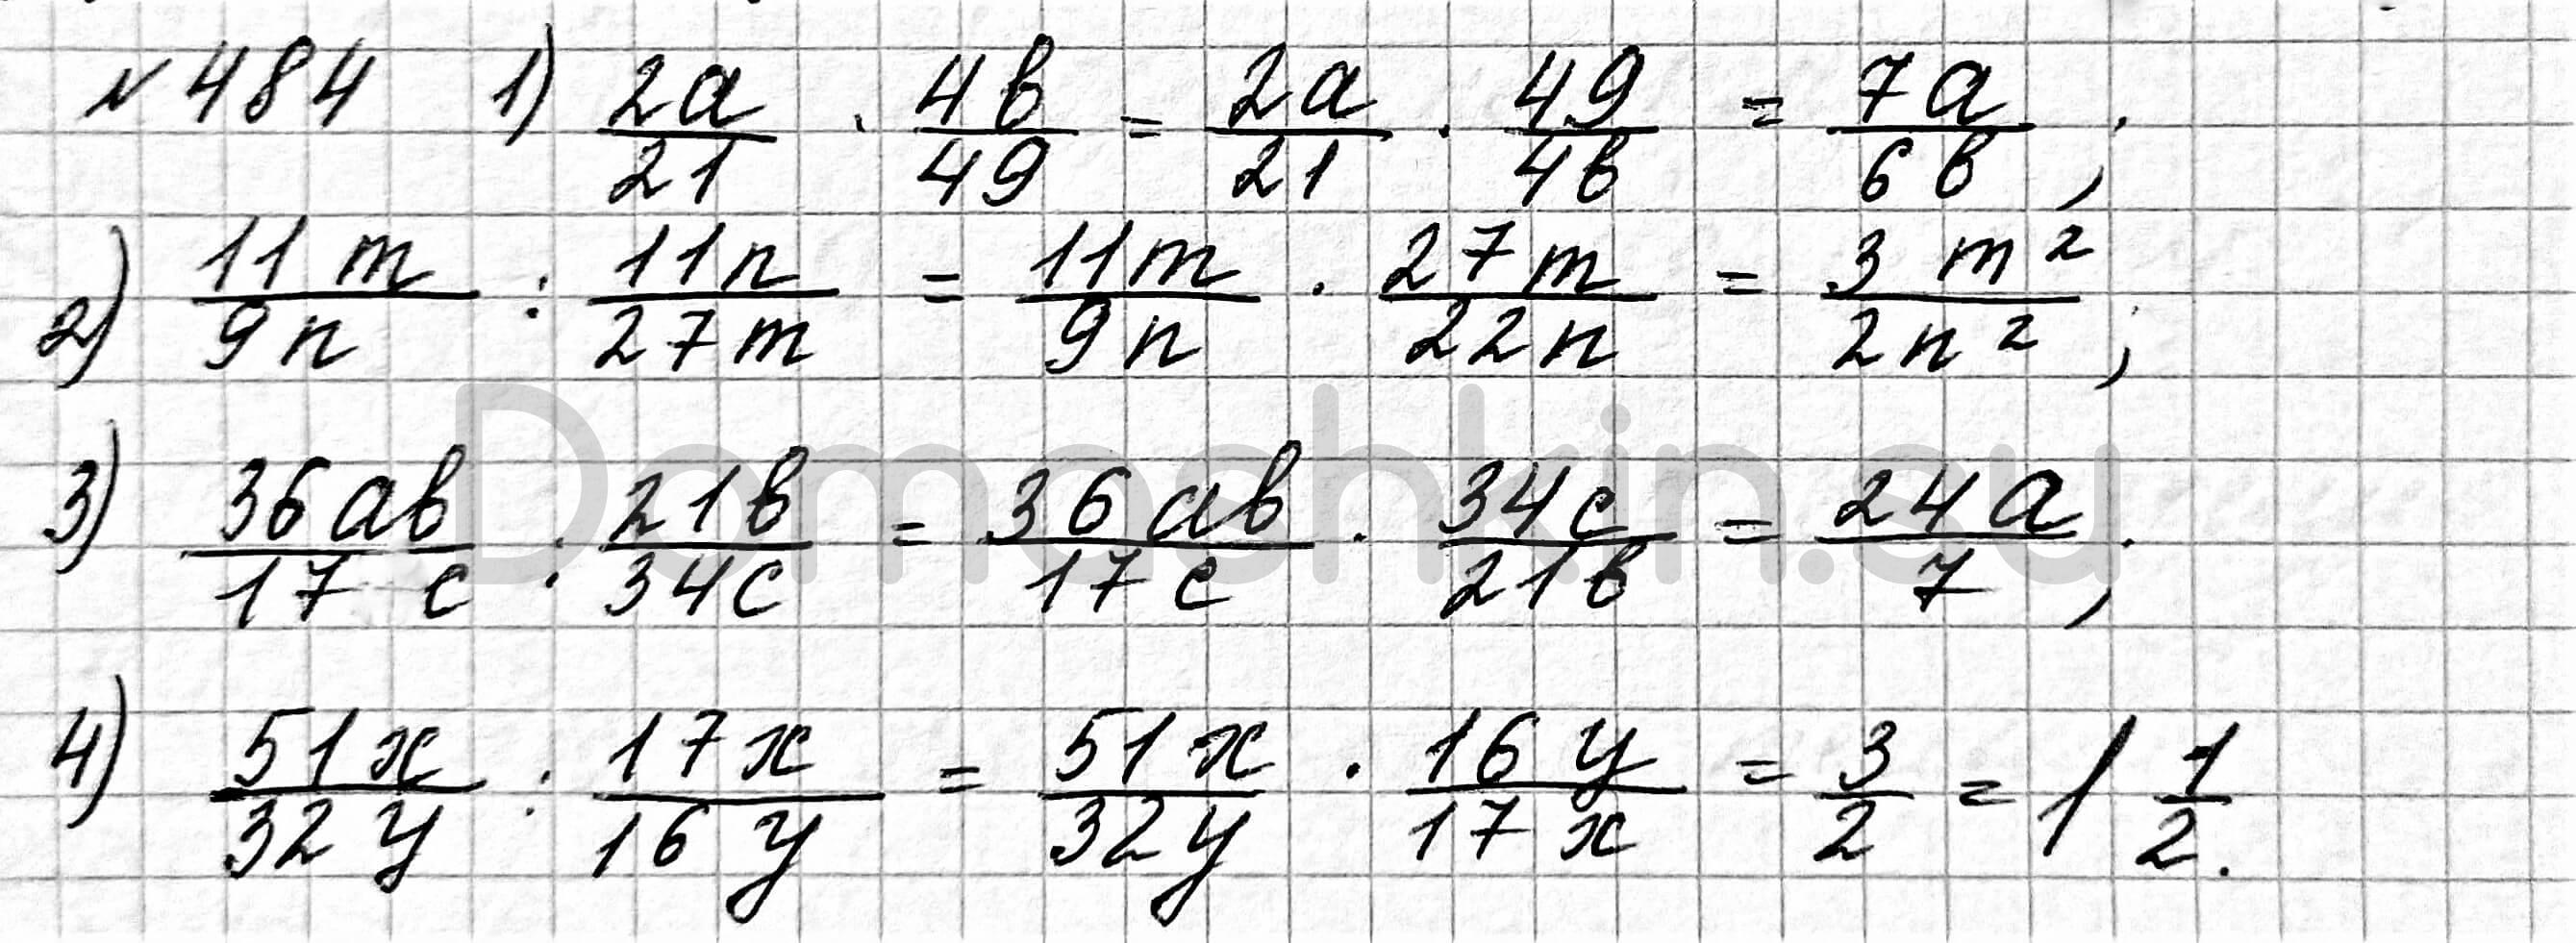 Математика 6 класс учебник Мерзляк номер 484 решение